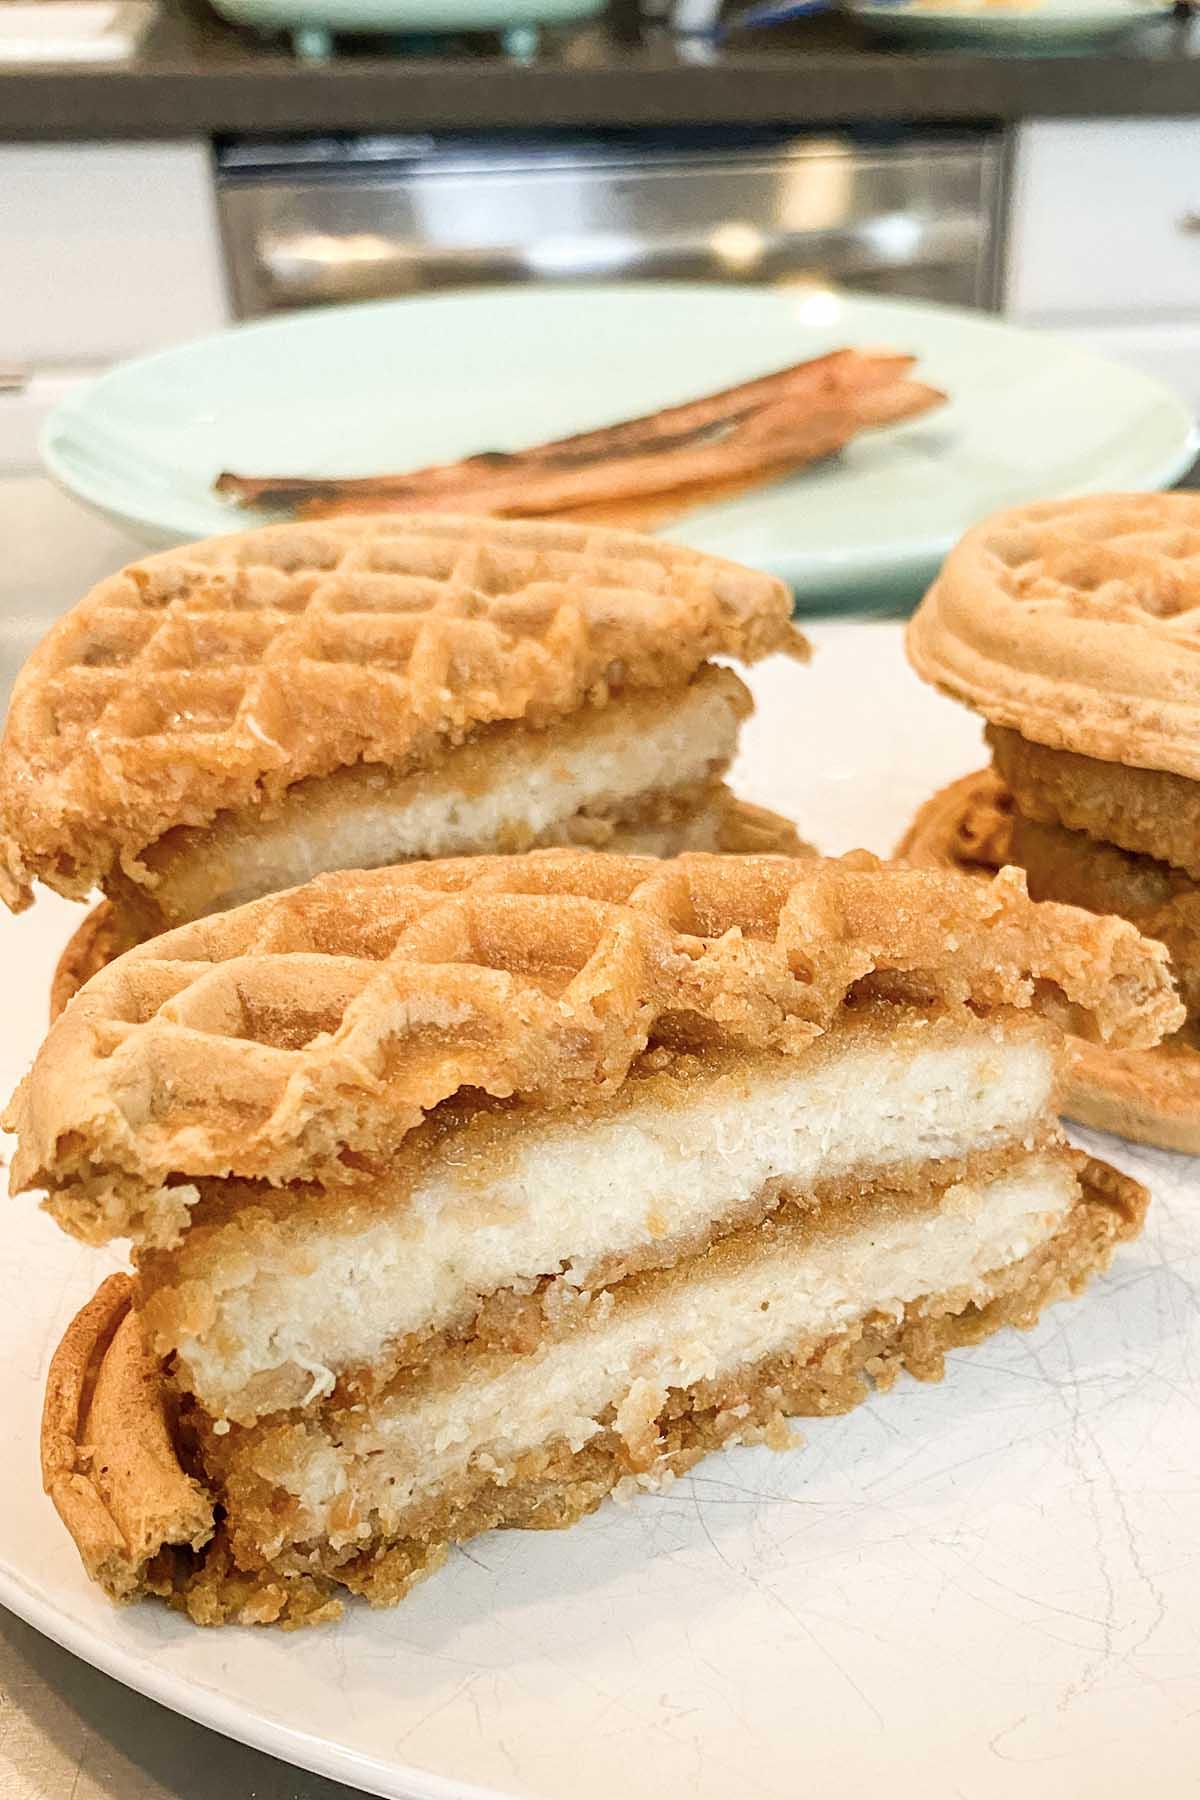 waffle with vegan chicken patties on it